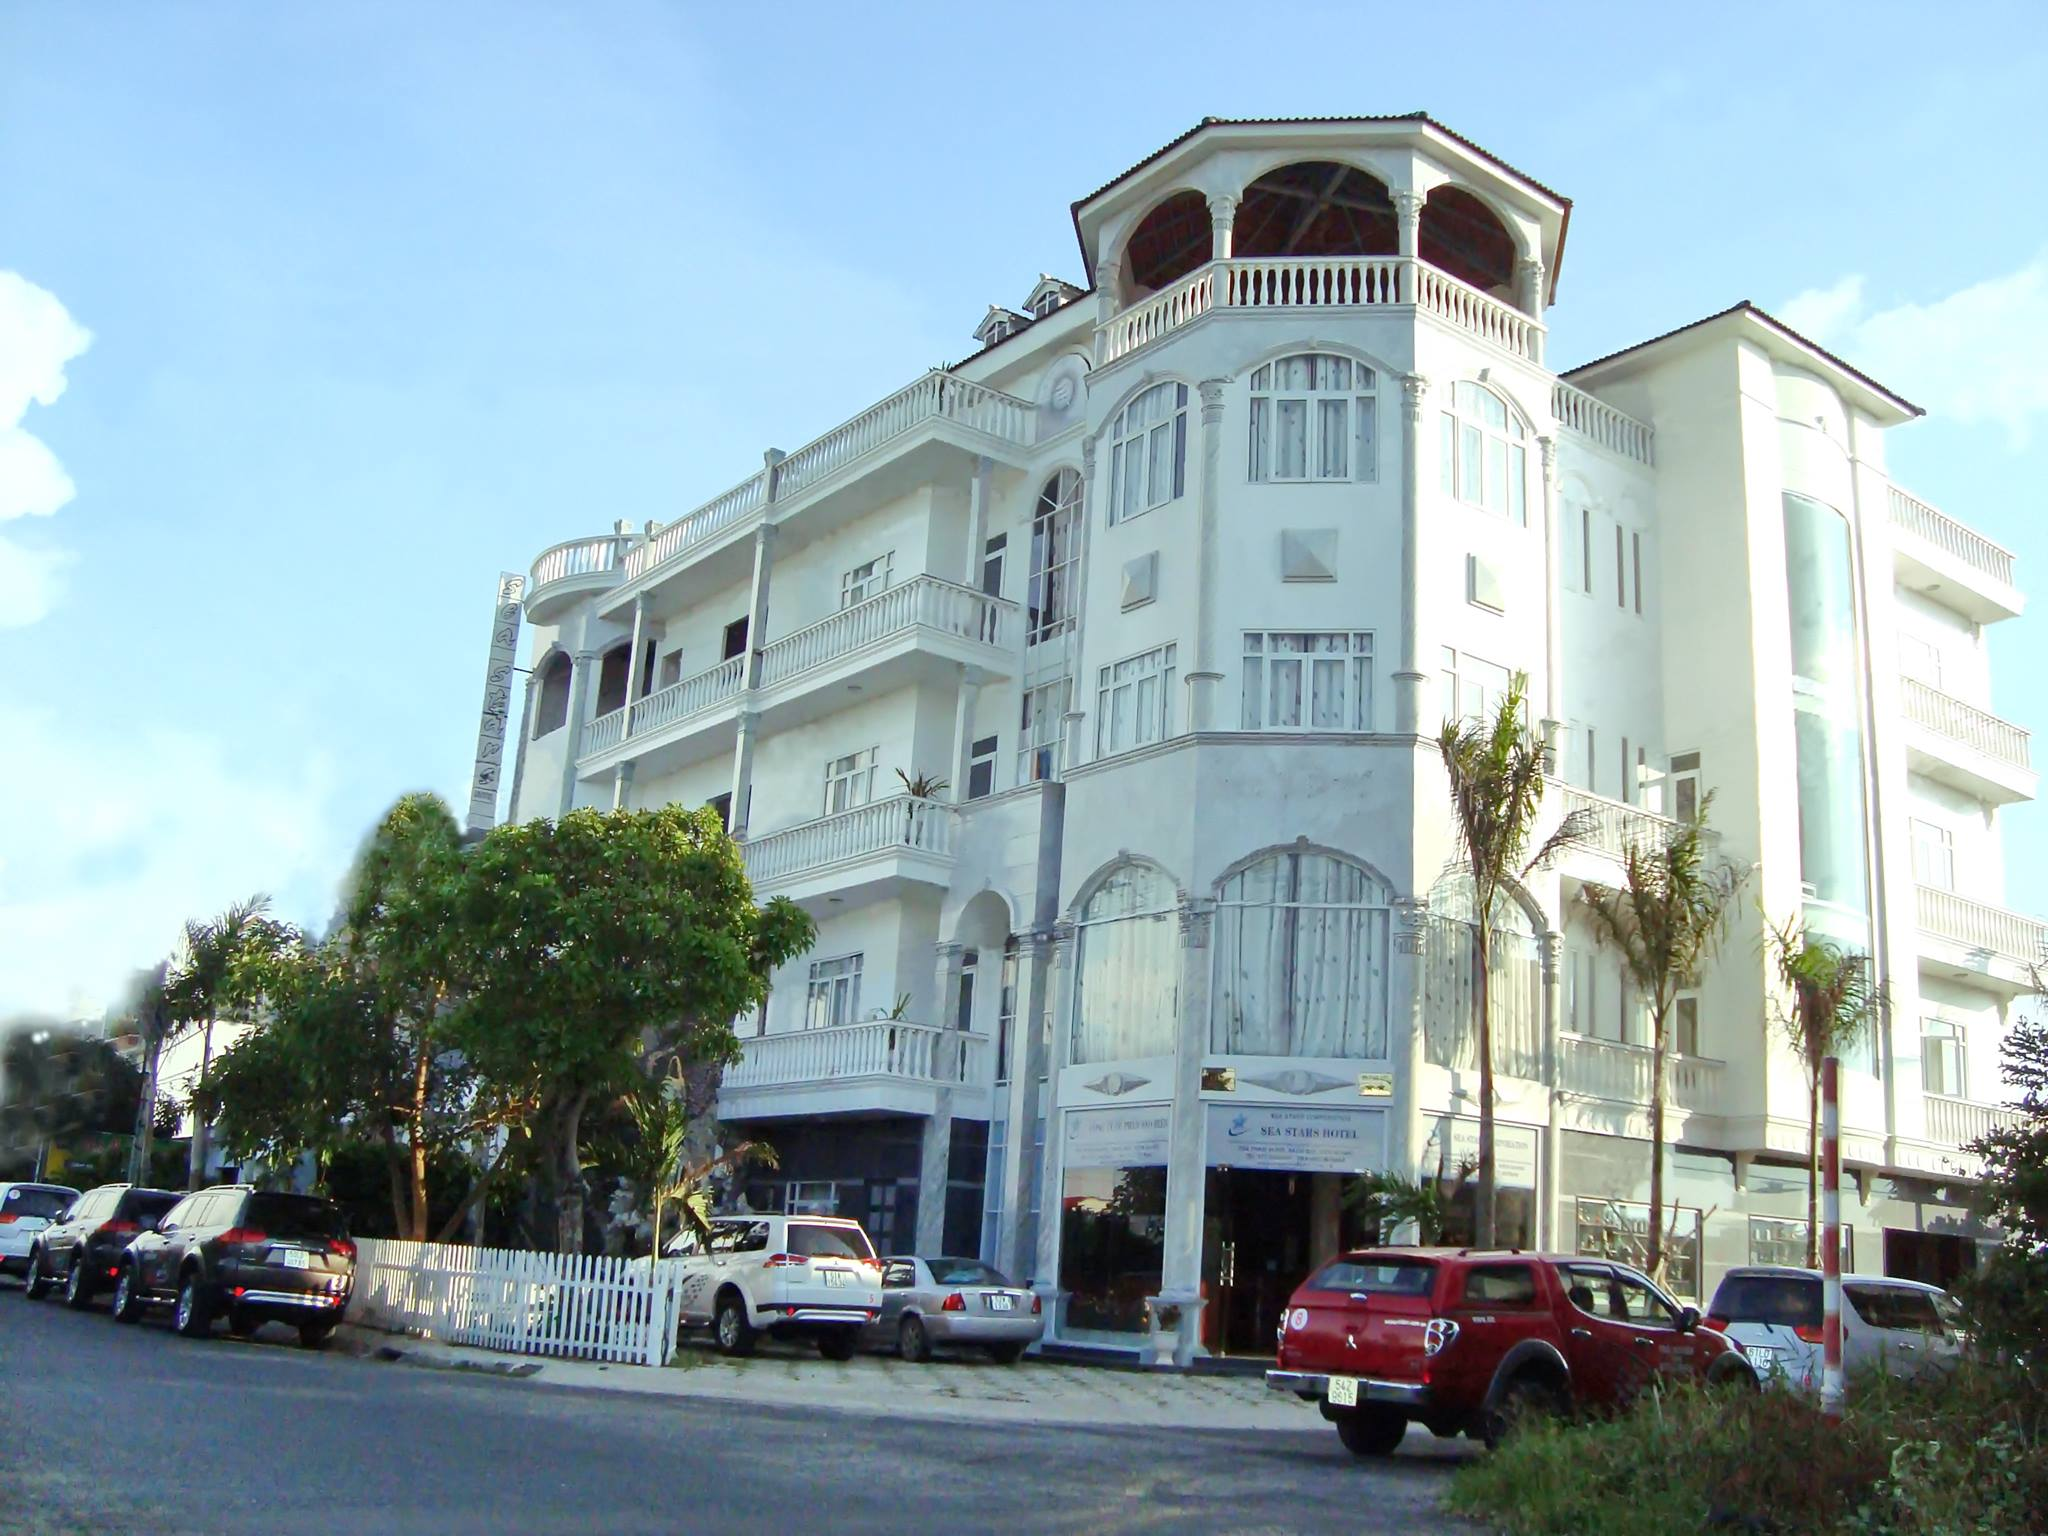 Sea stars hotel - hotel at the price